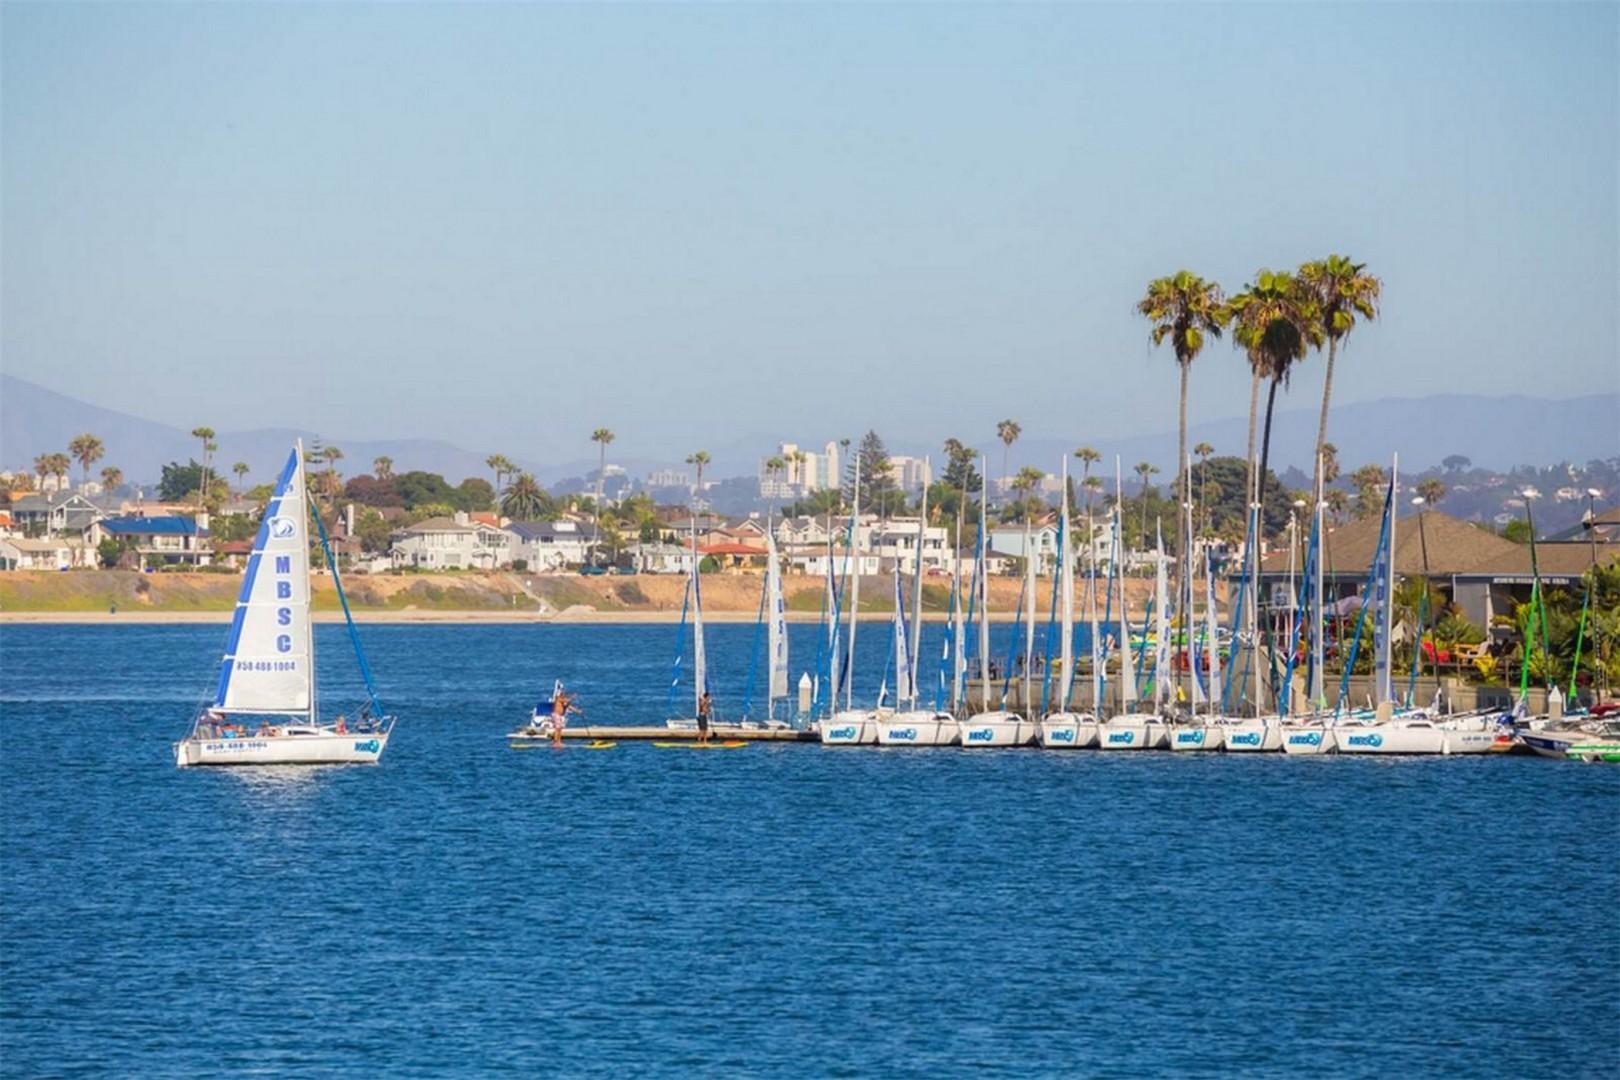 Mission Bay Boat Rentals